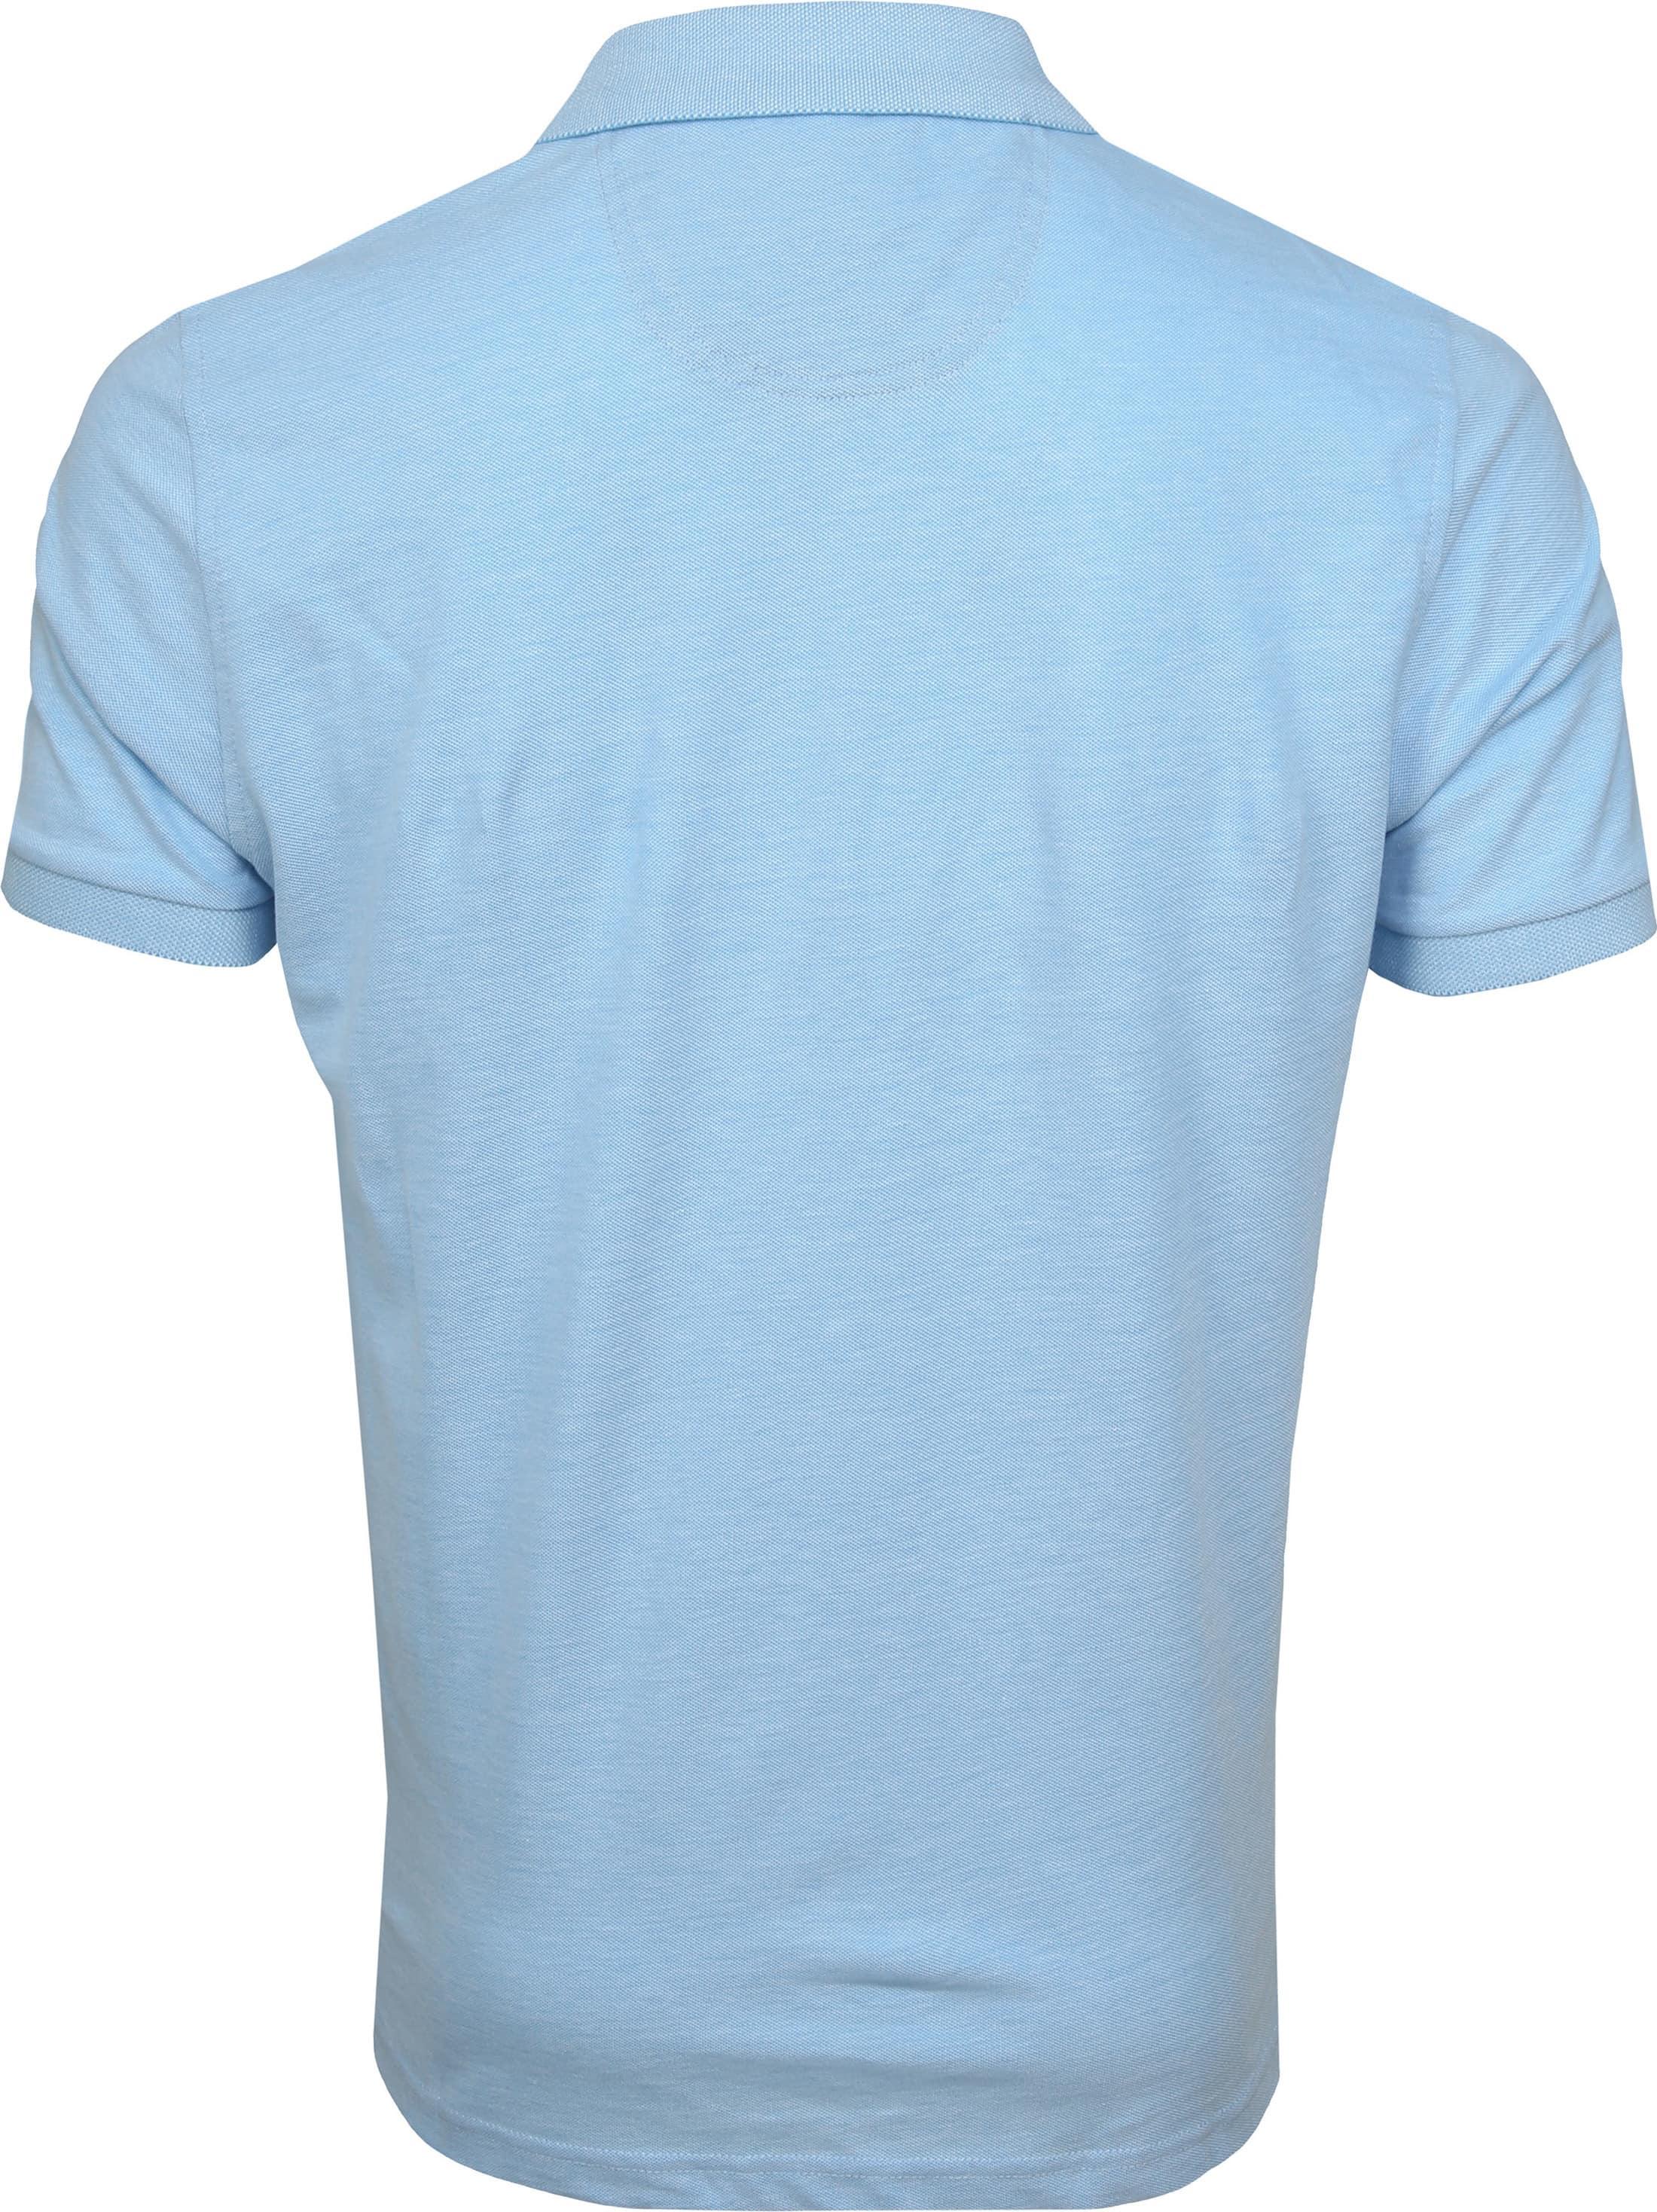 Suitable Oxford Poloshirt Blue photo 3